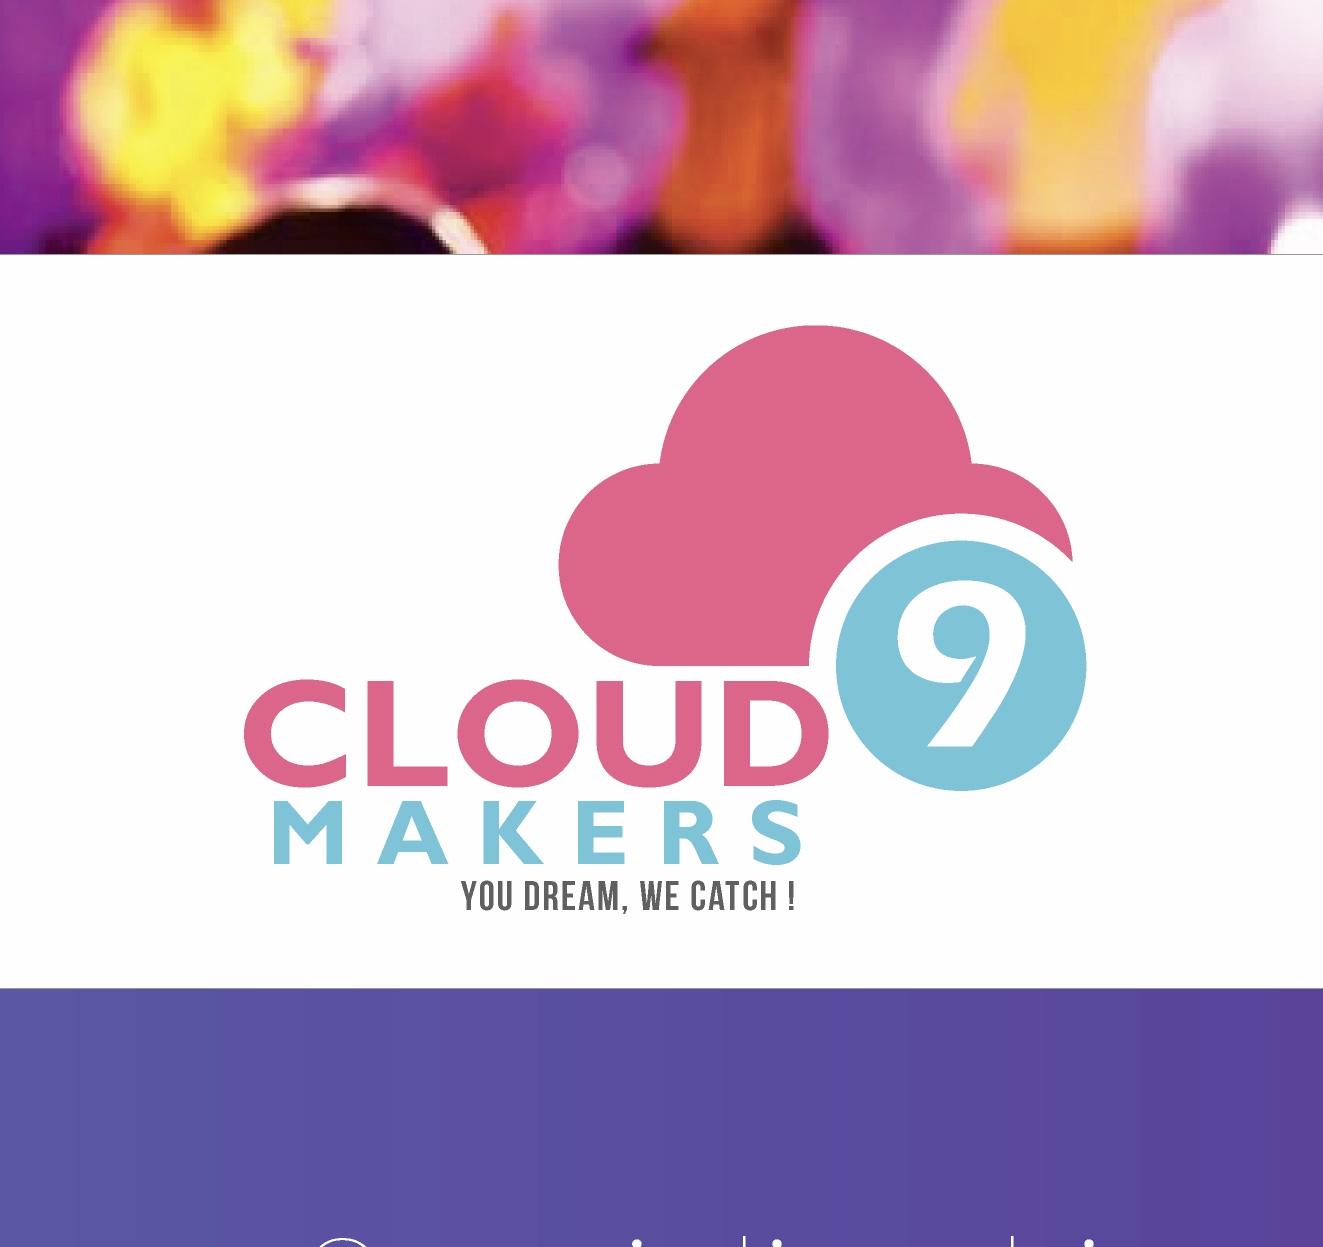 Prathyusha Davuluru: Cloud9Makers